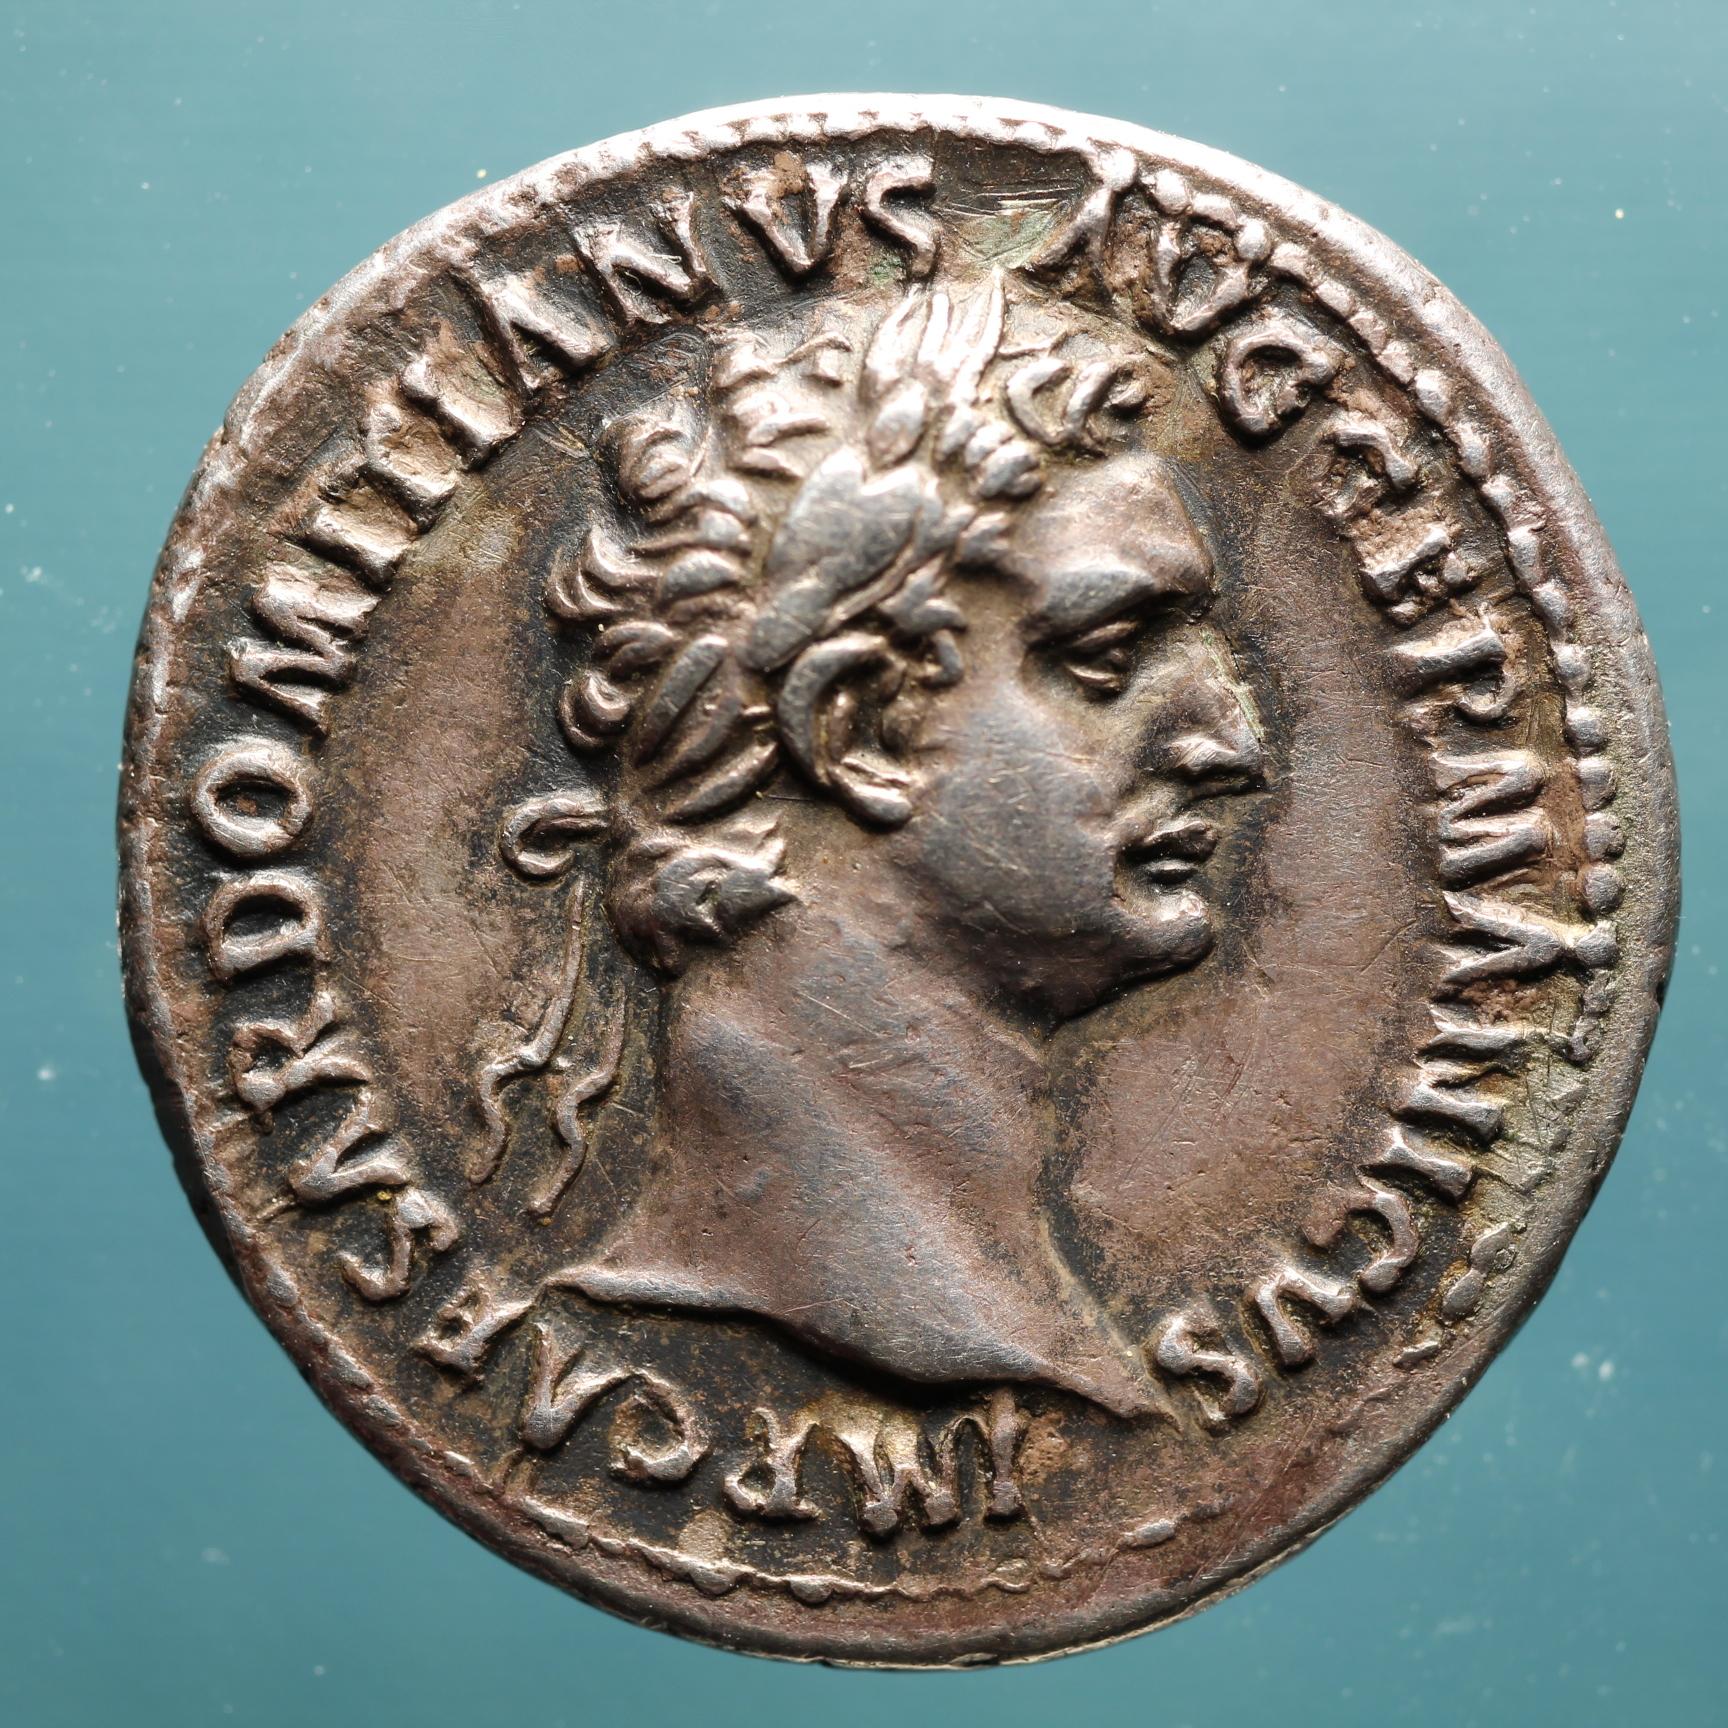 RIC 563 (R3, this coin)